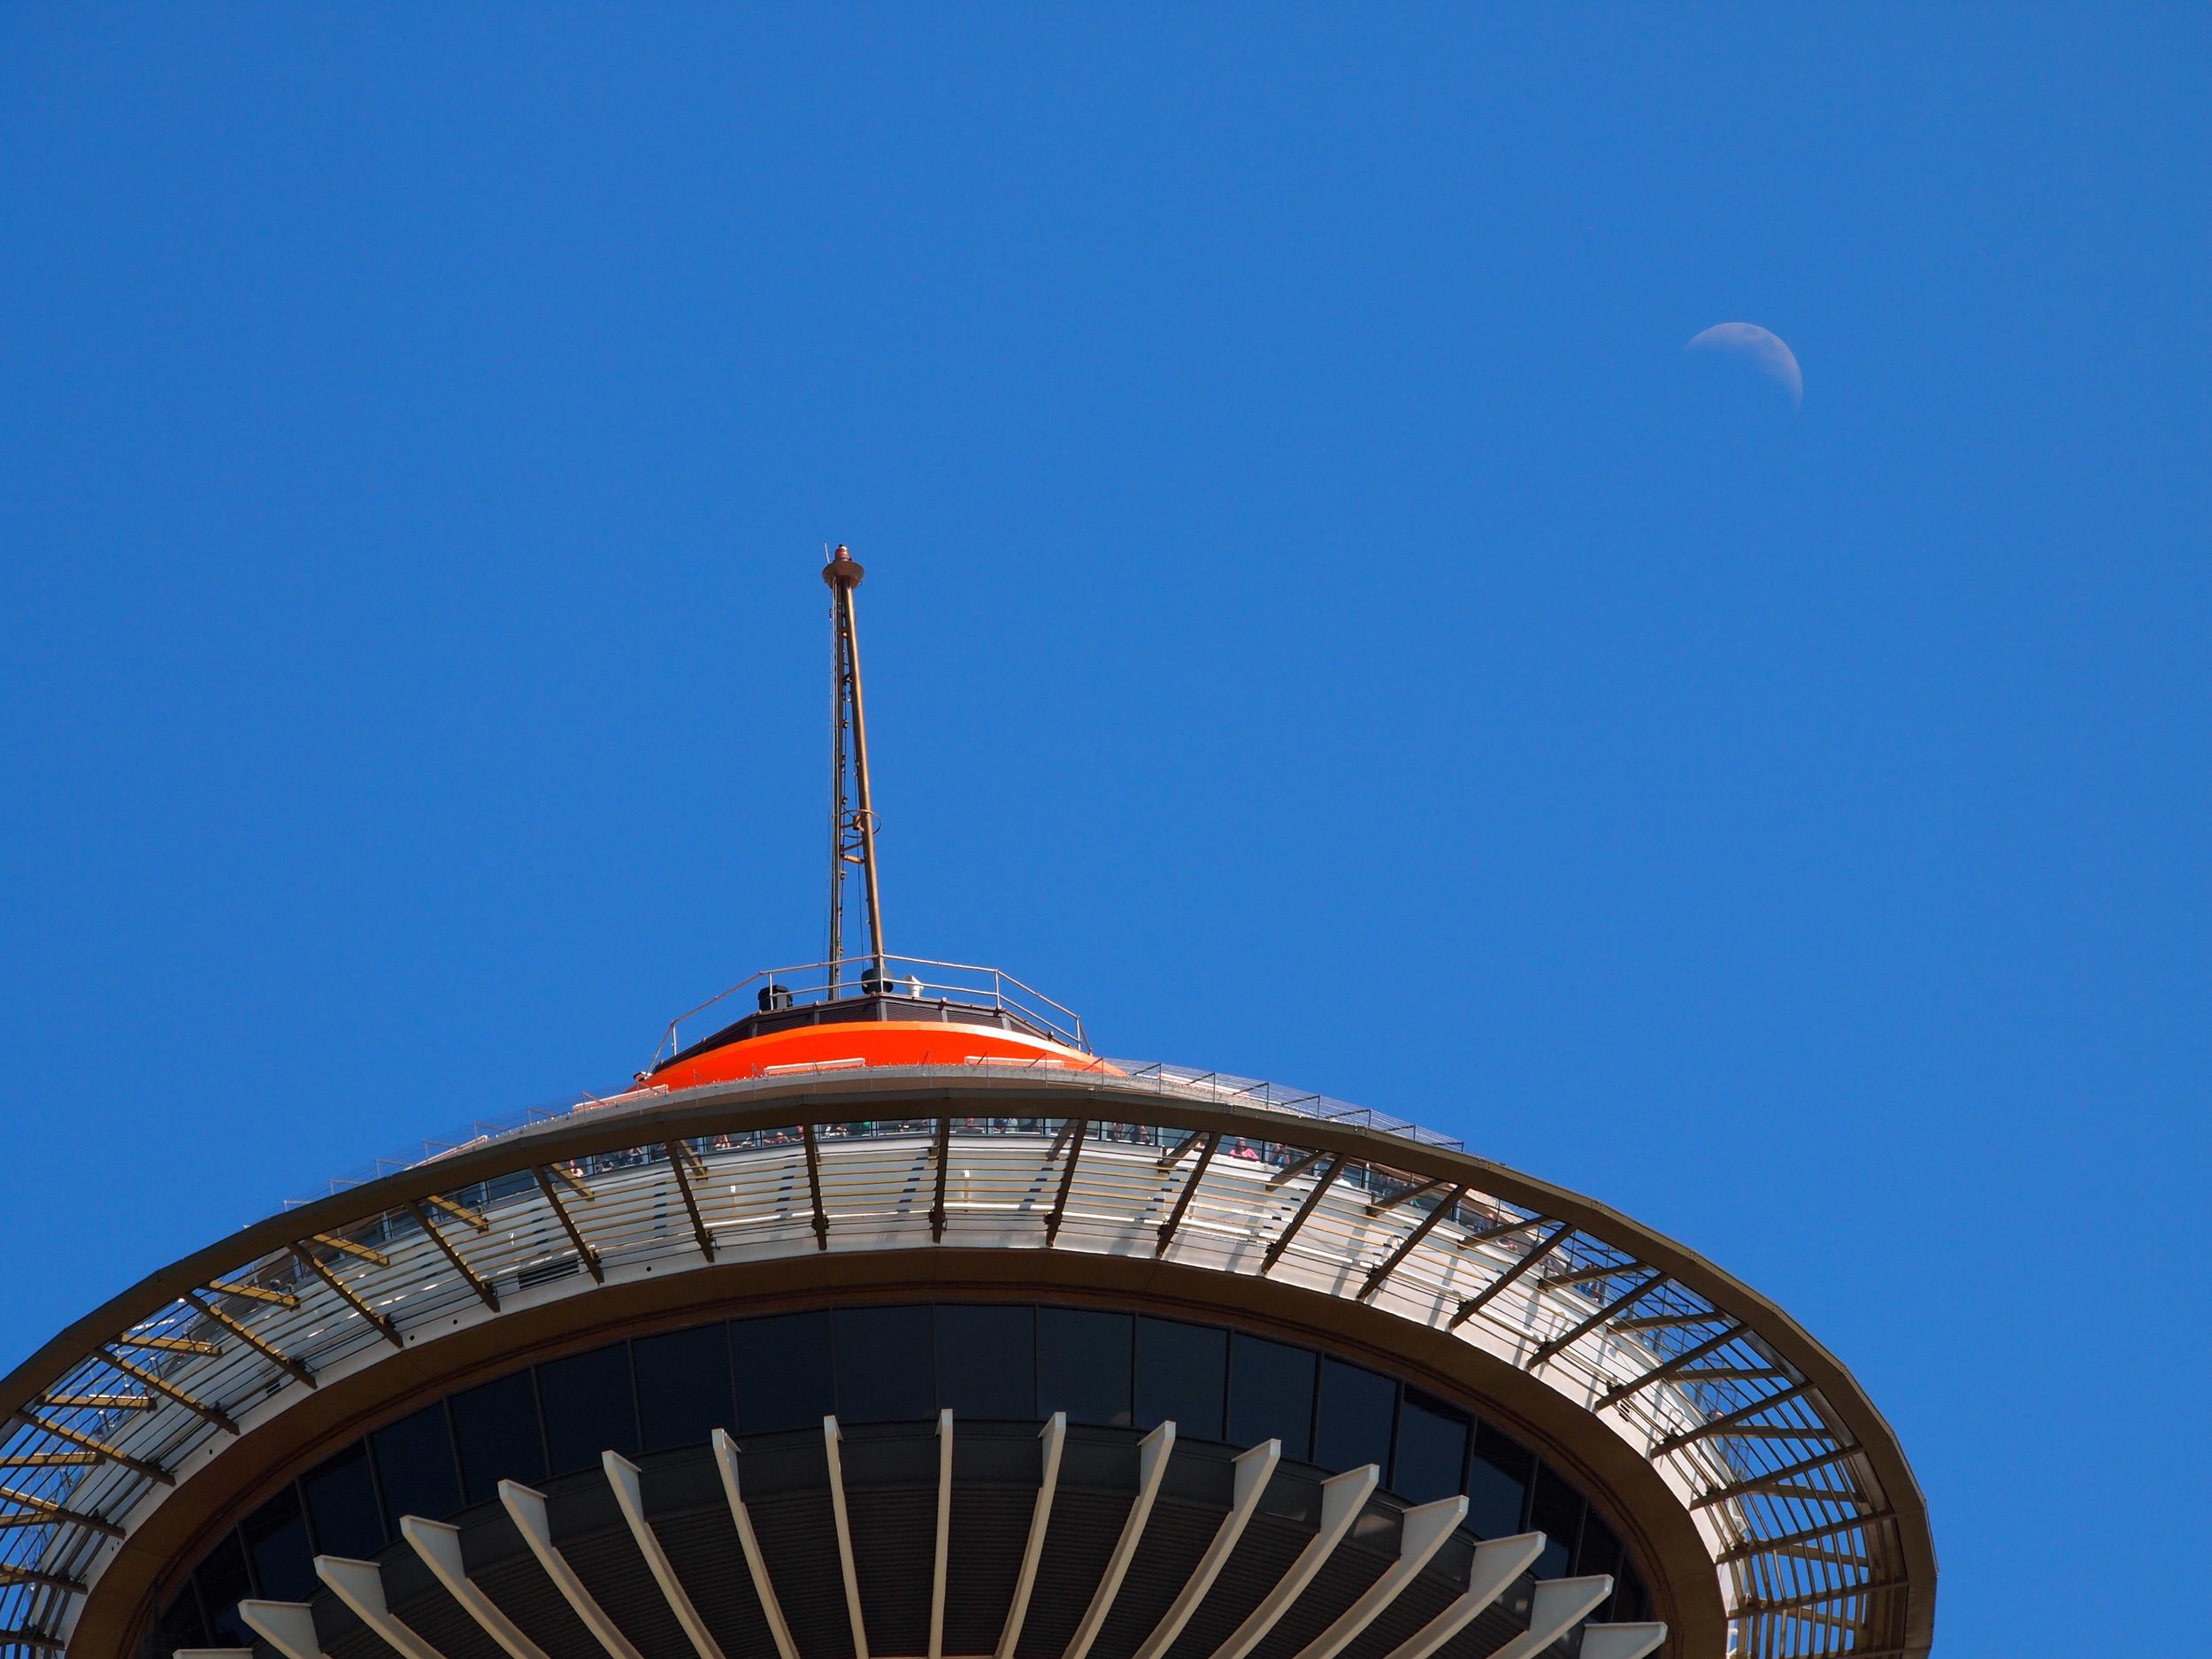 #space #needle #crescent #moon#seattle #washington #usa #needleweek